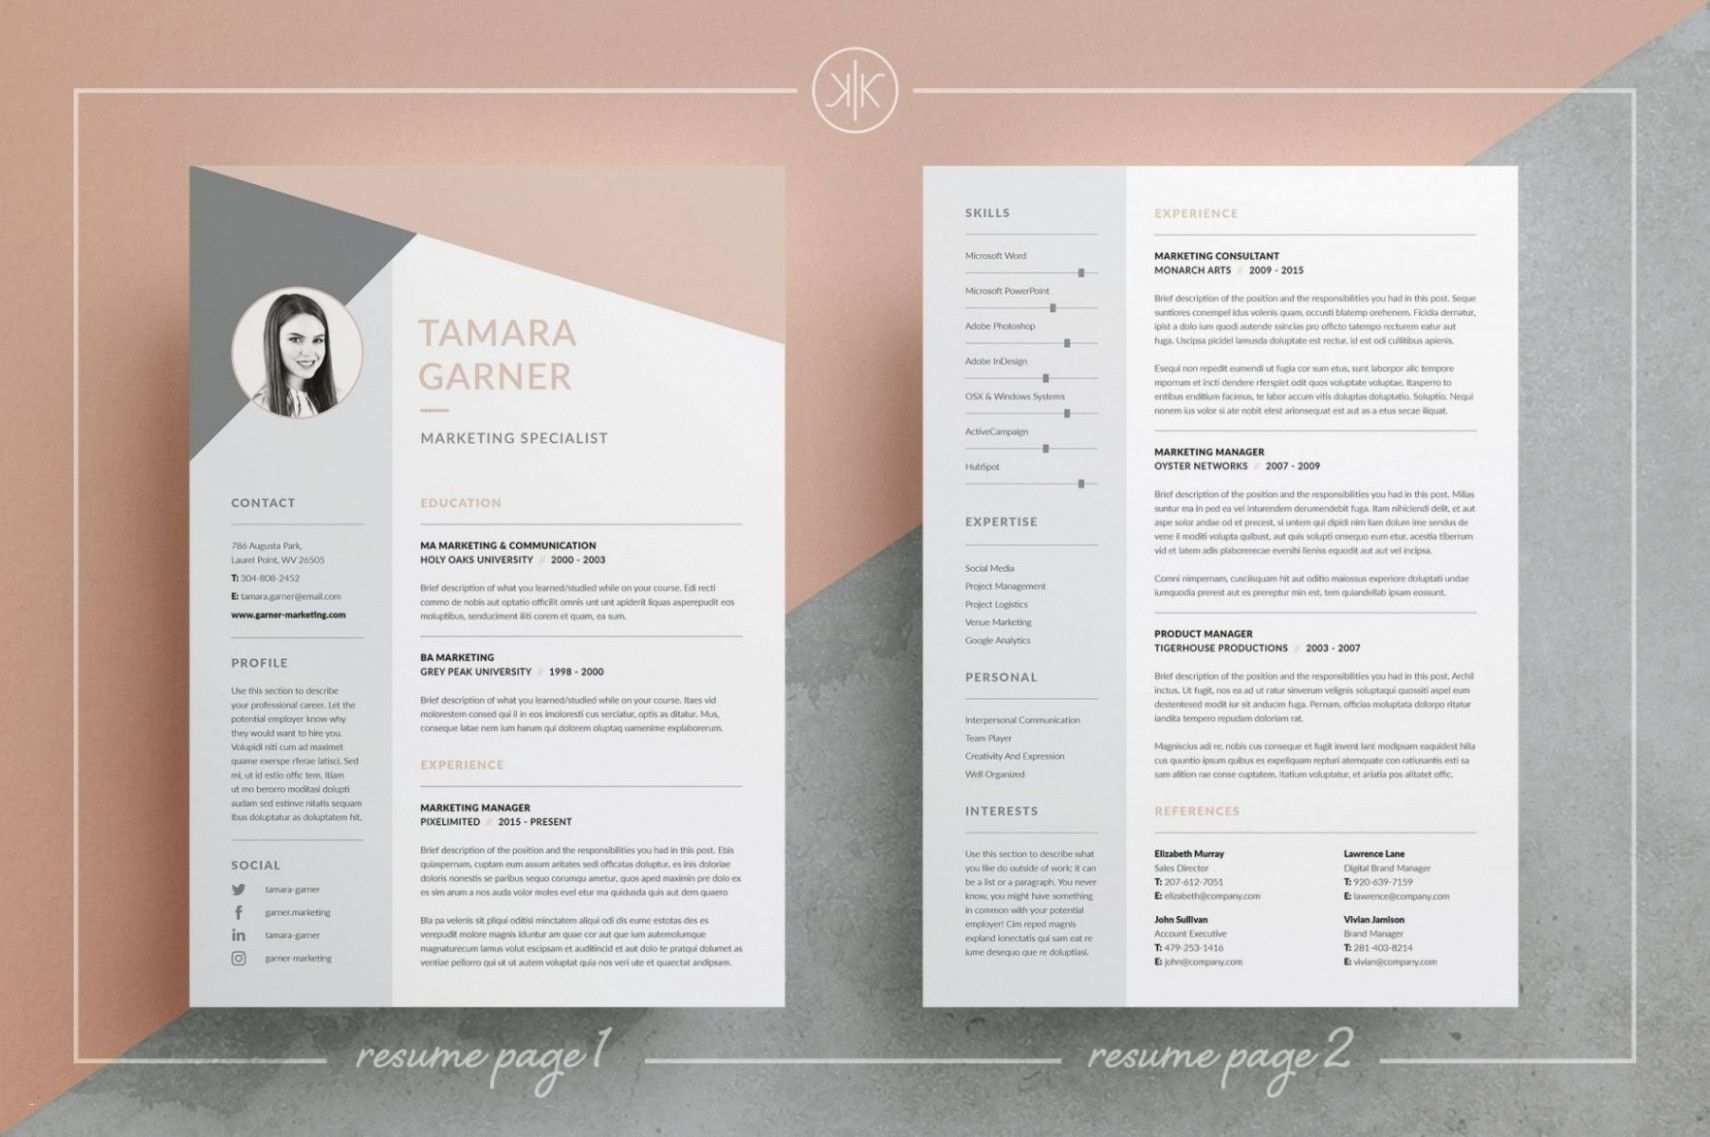 Lebenslauf Kreativ Vorlage Word Lebenslauf Design Lebenslauf Design Vorlage Vorlagen Lebenslauf